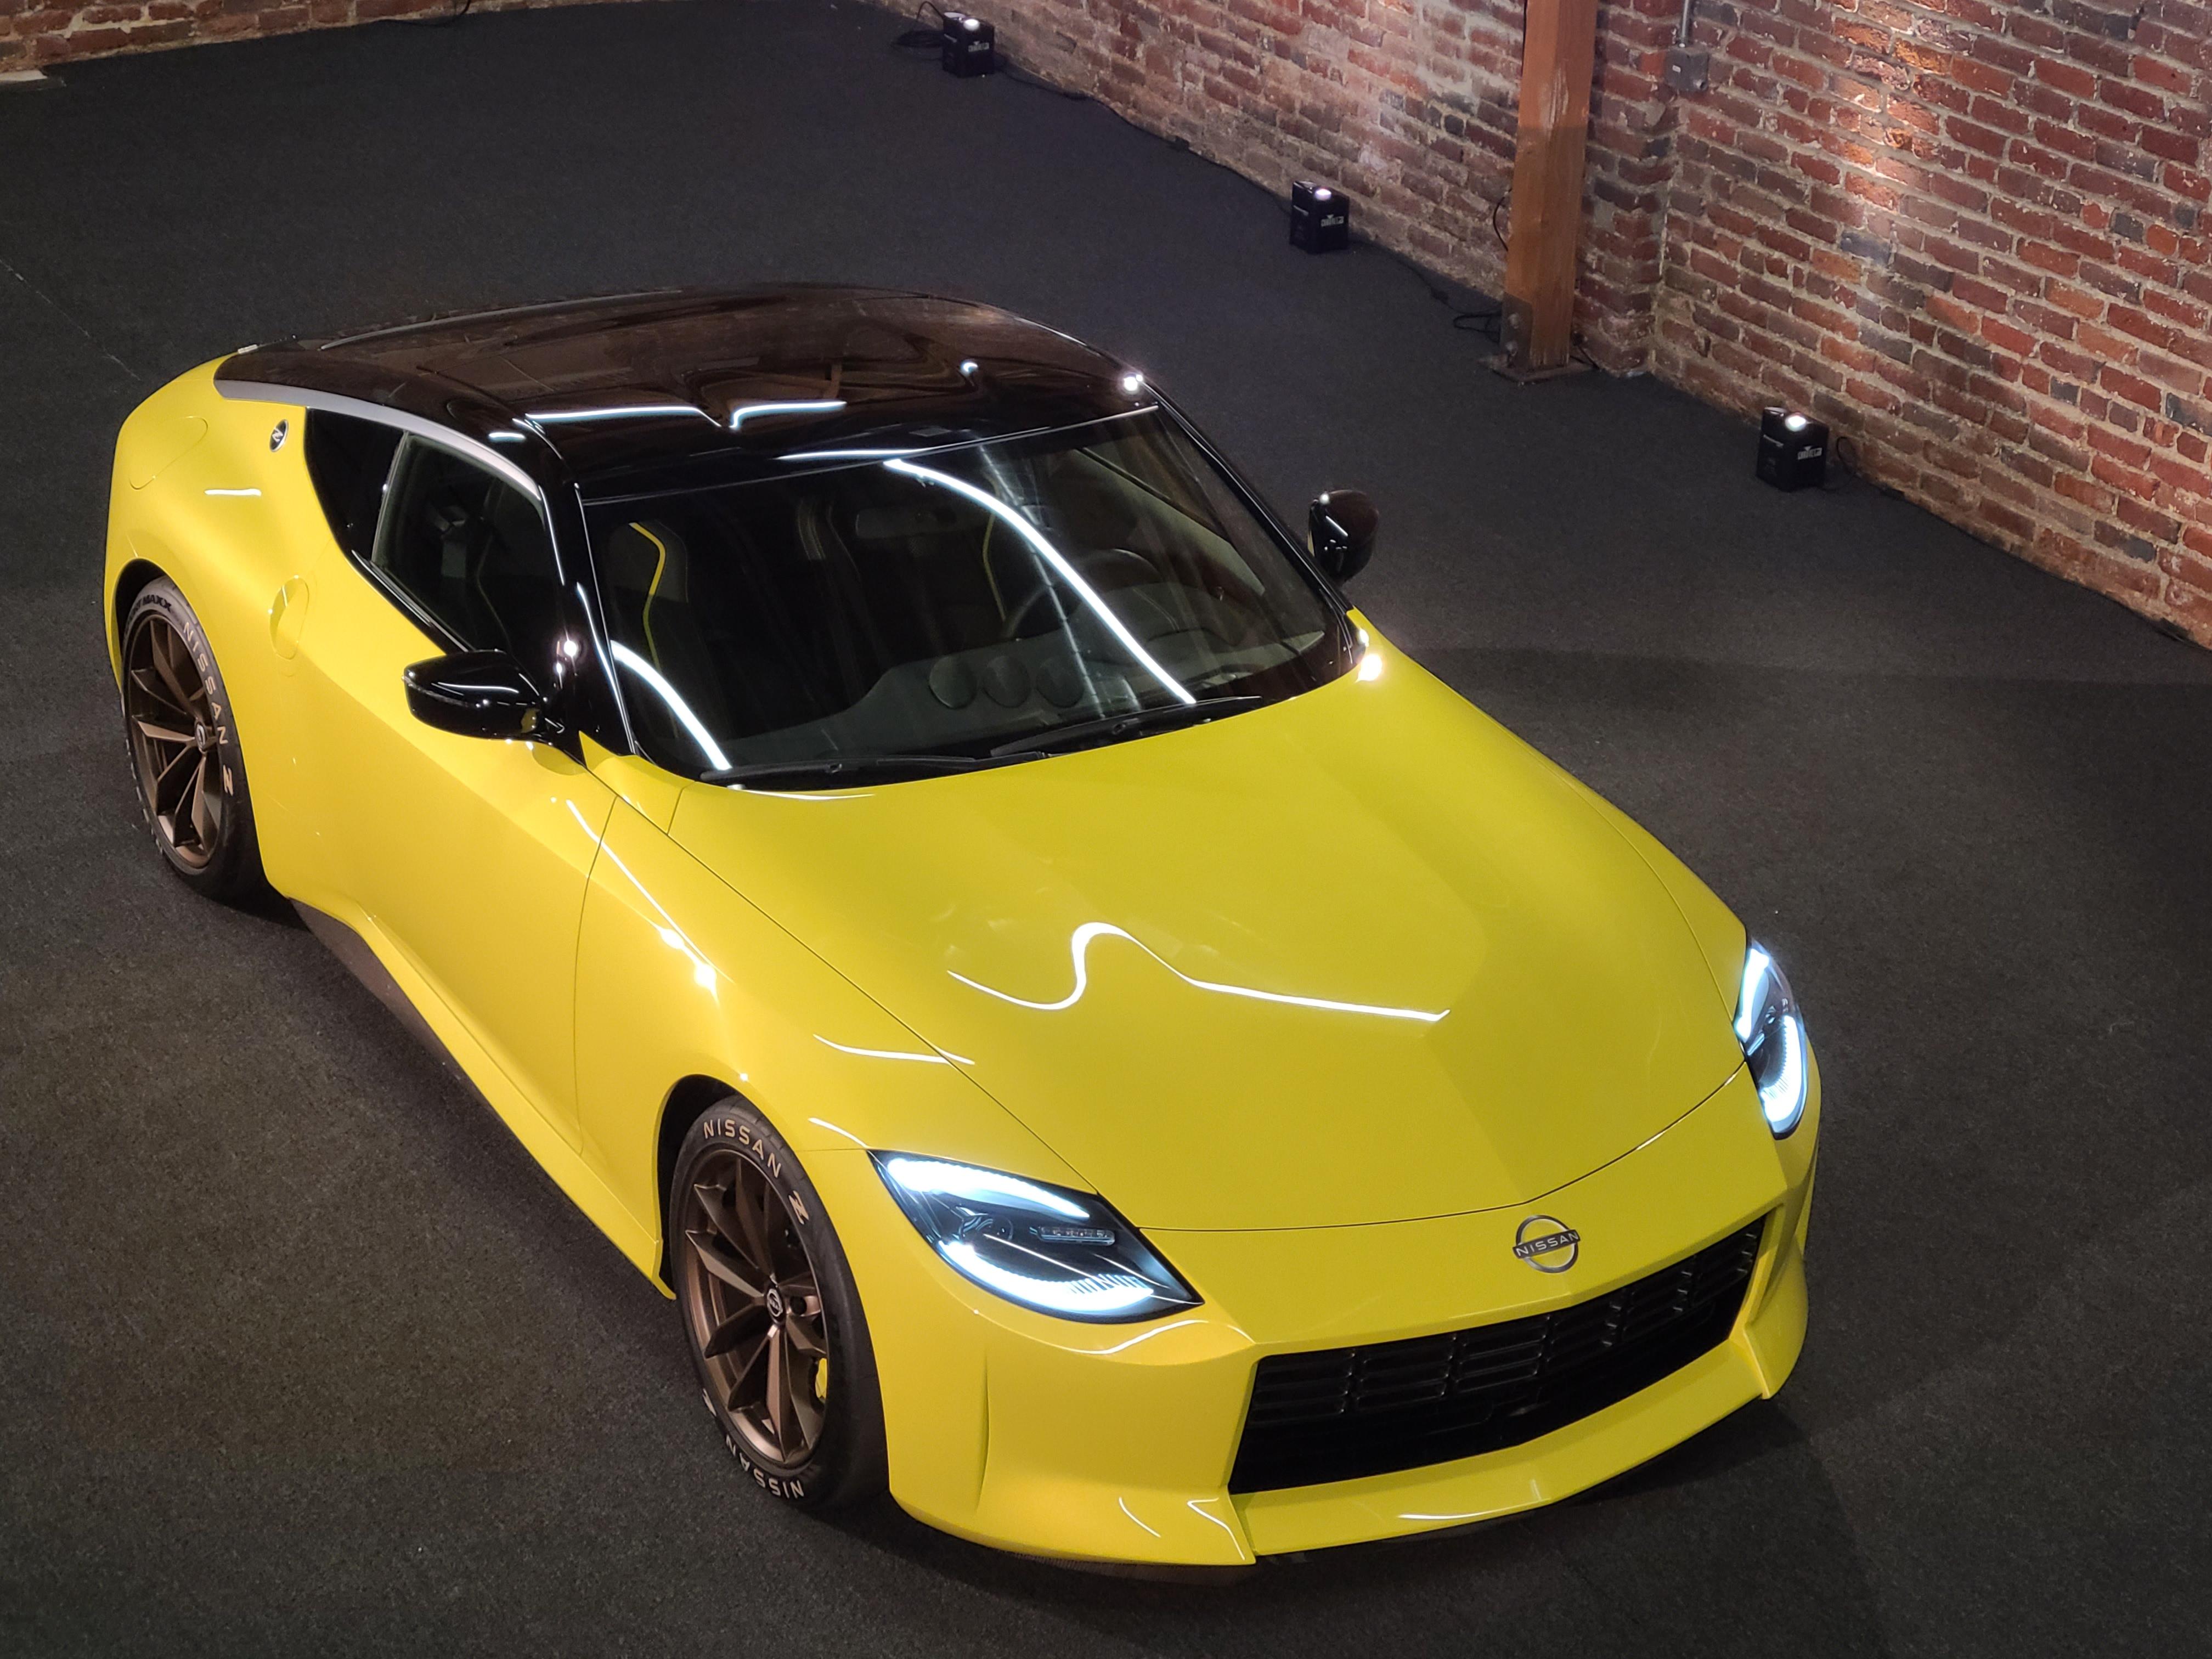 Nissan Z Proto : Prototype Z 2020 Concept